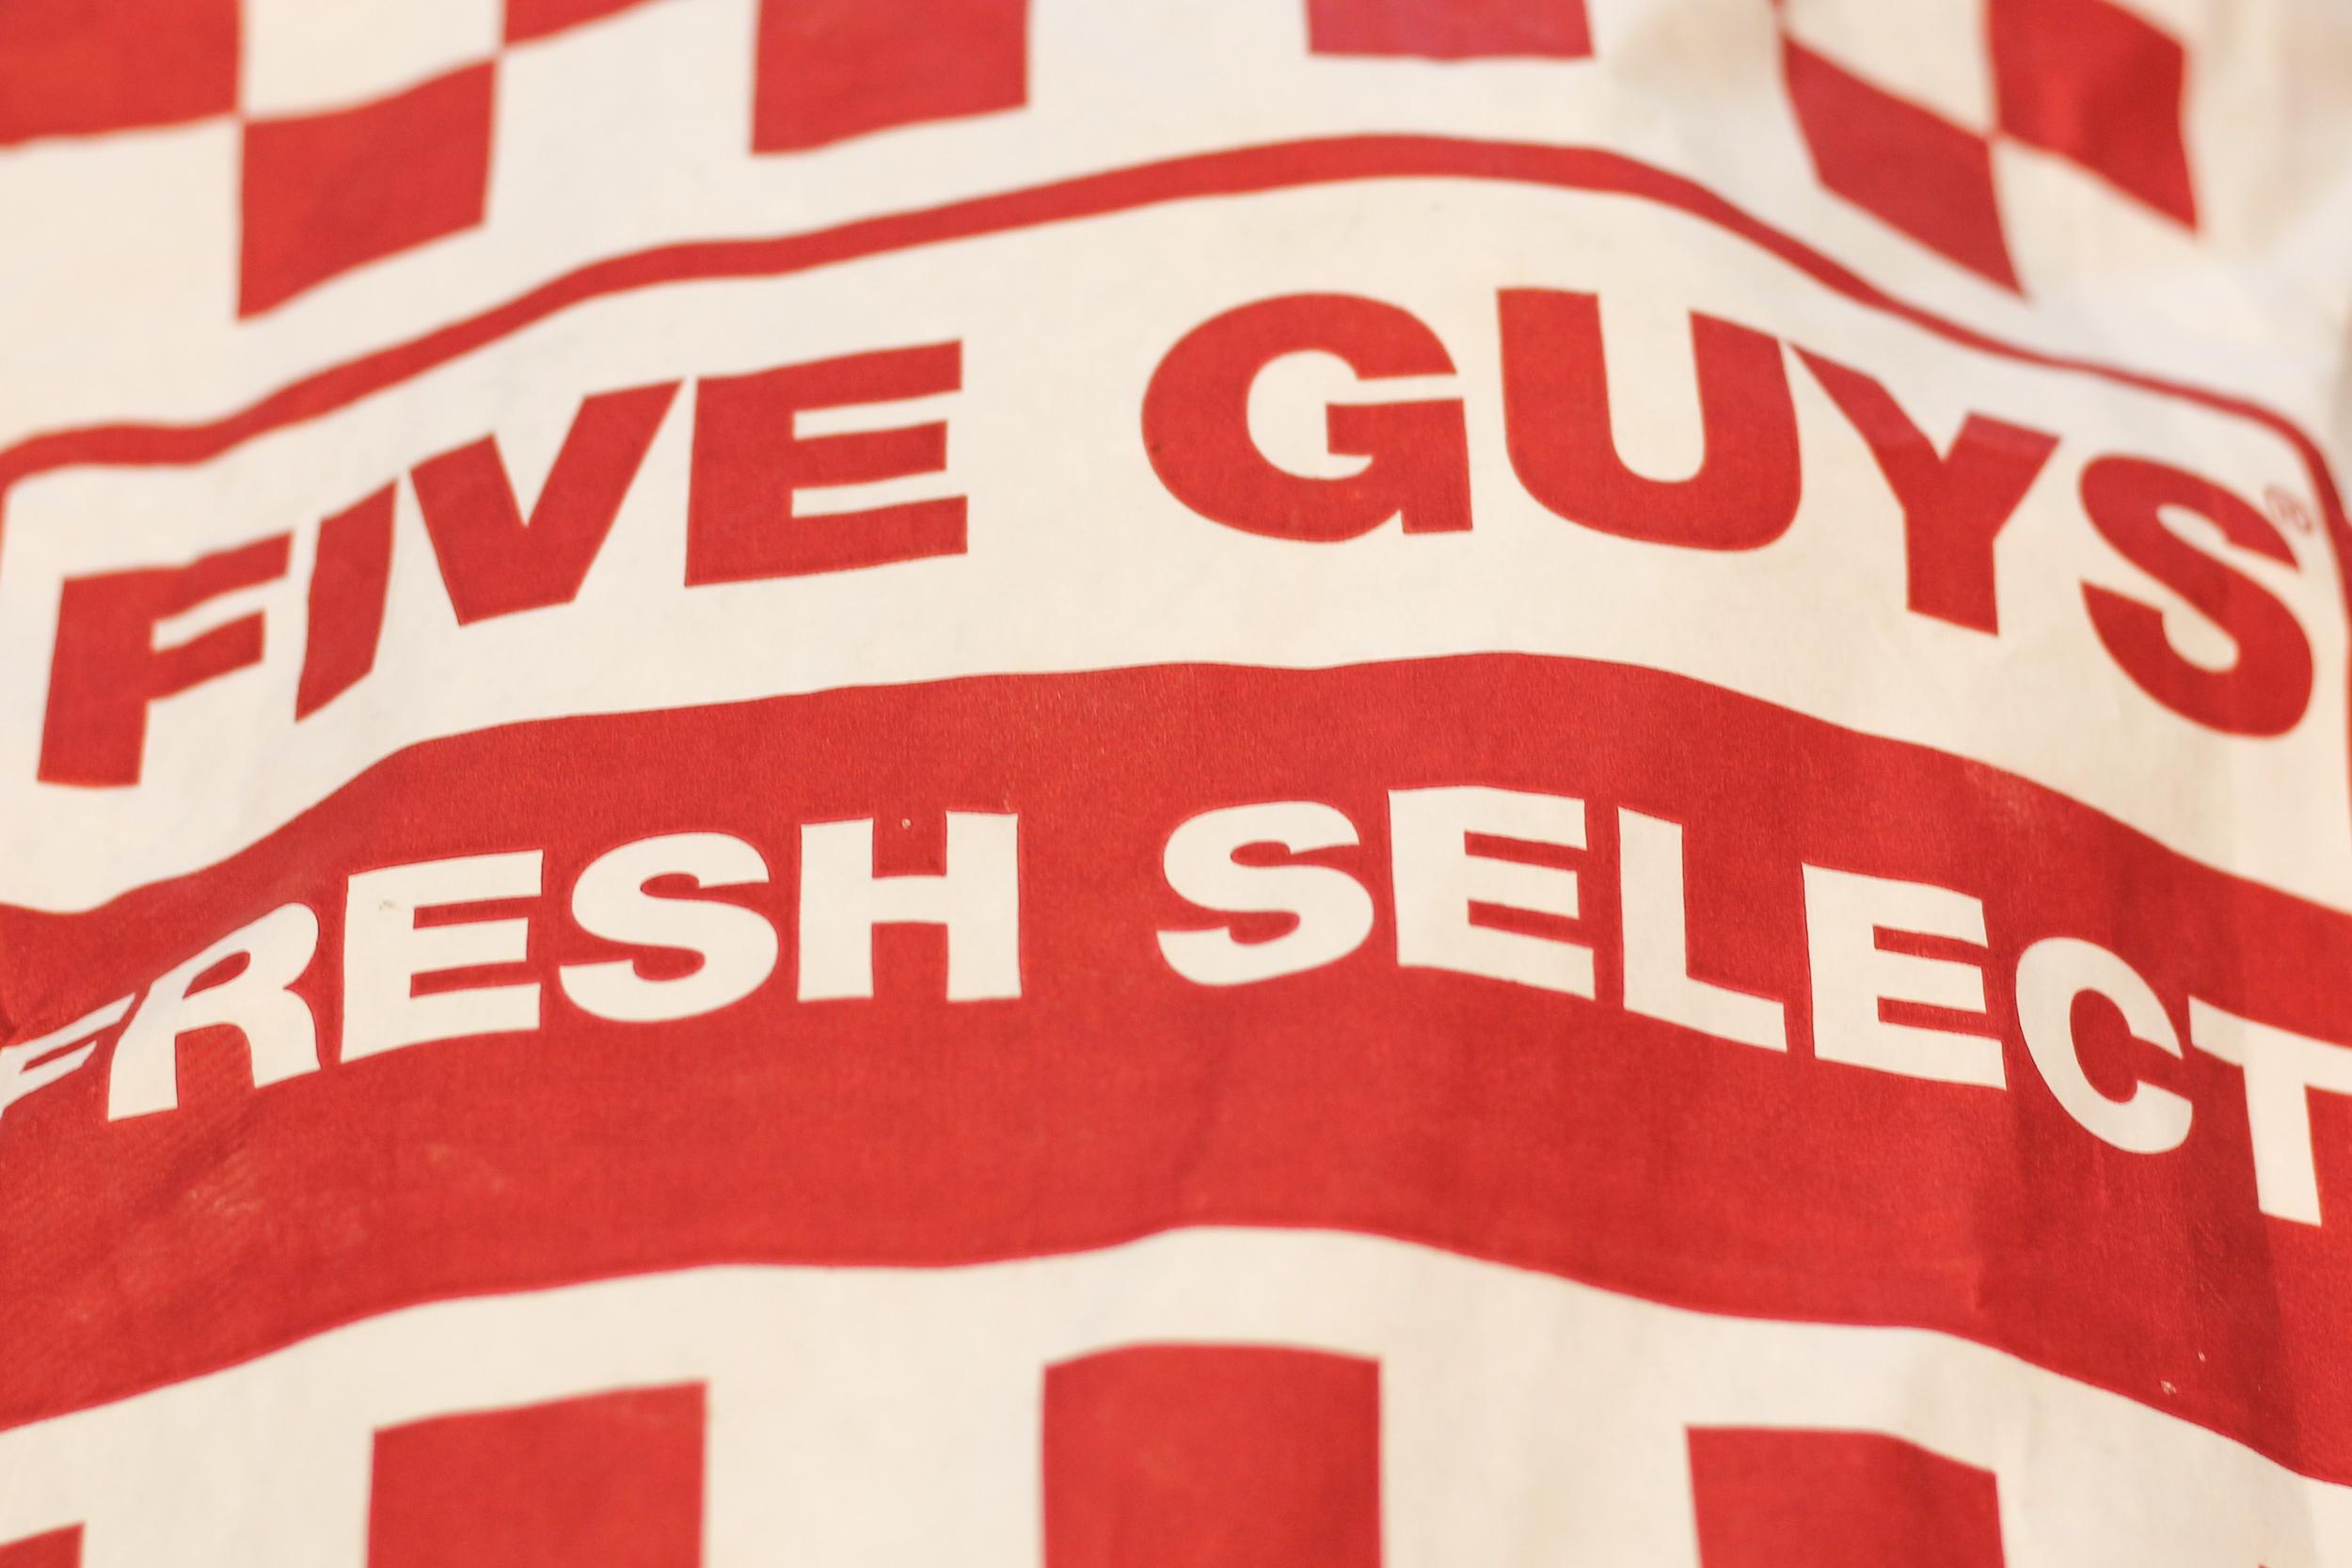 5 Guys Gluten Free